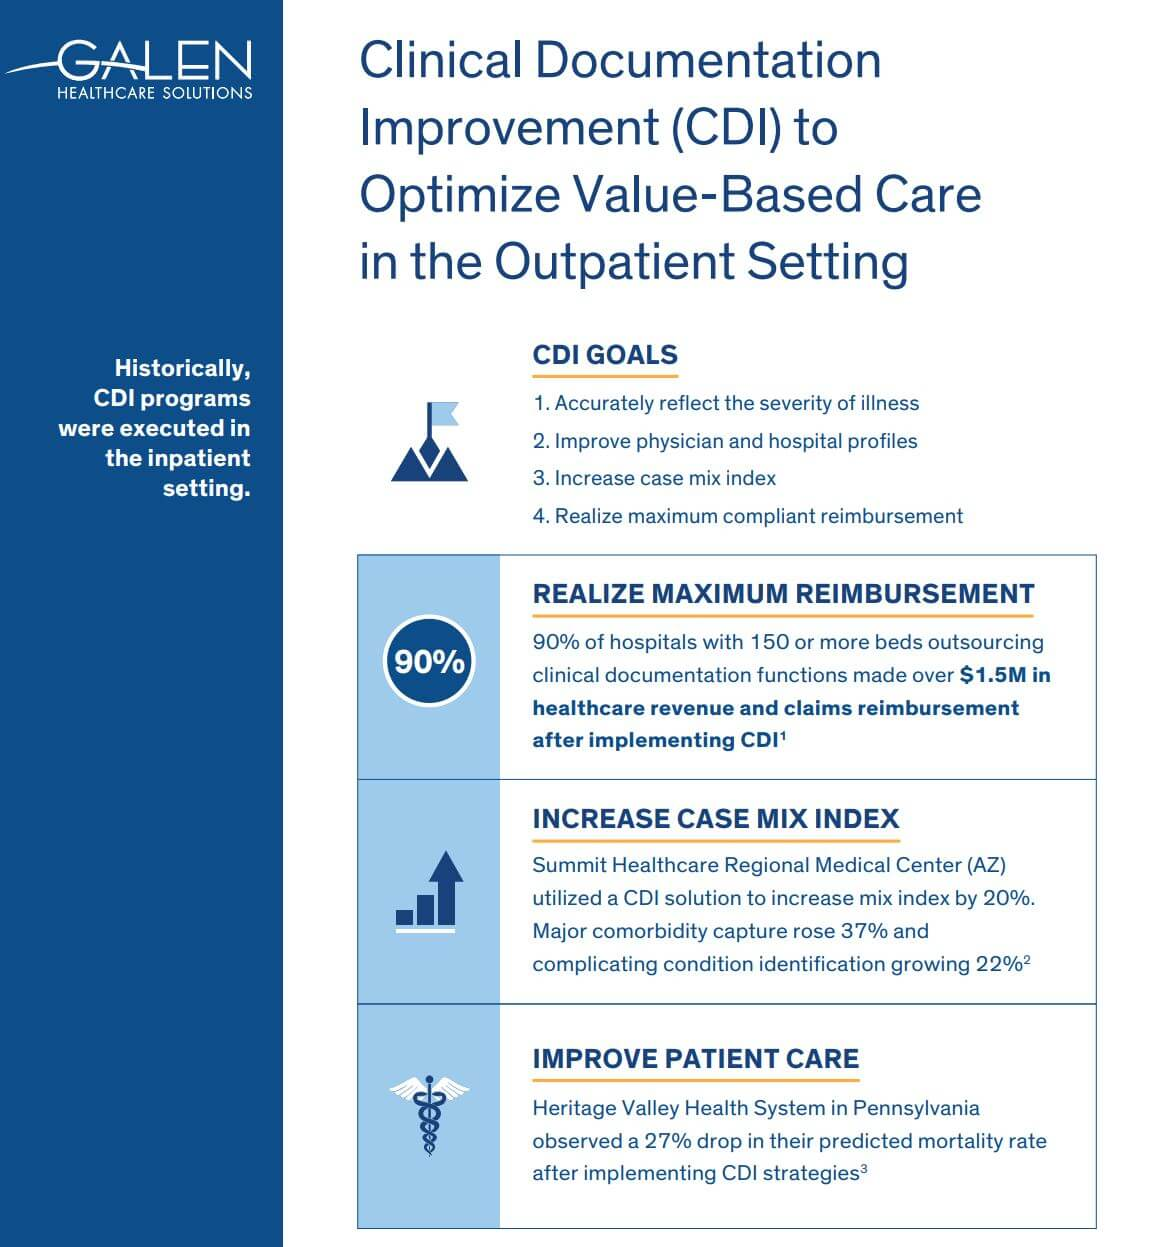 Outpatient Clinical Documentation Improvement Infographic